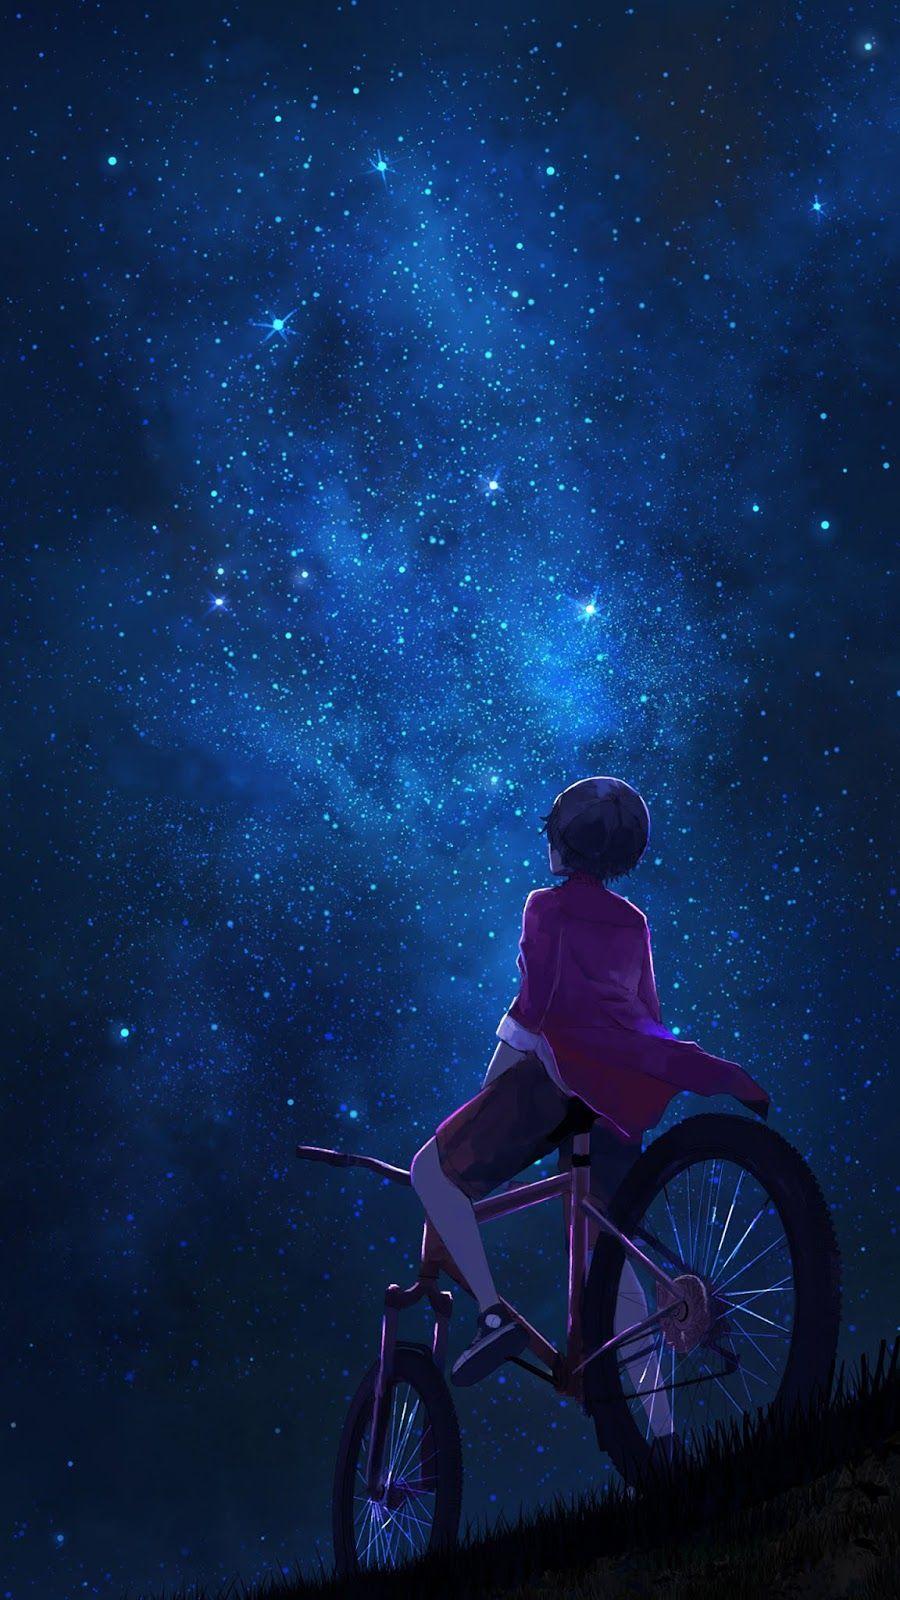 Watching the starry night Sky anime, Anime artwork